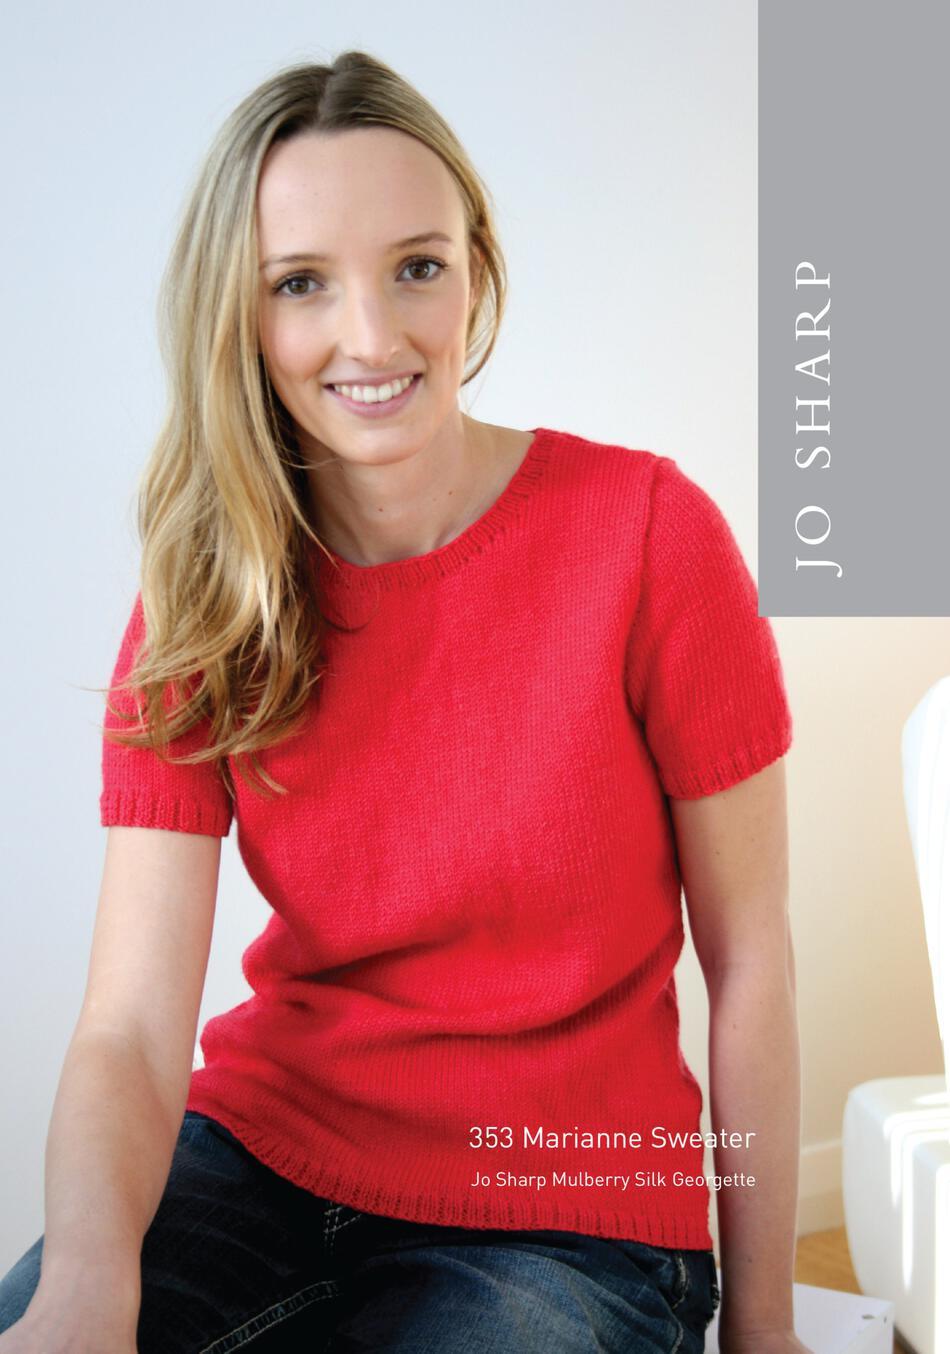 be585376f Jo Sharp Marianne Sweater - Pattern Download Knitting Pattern